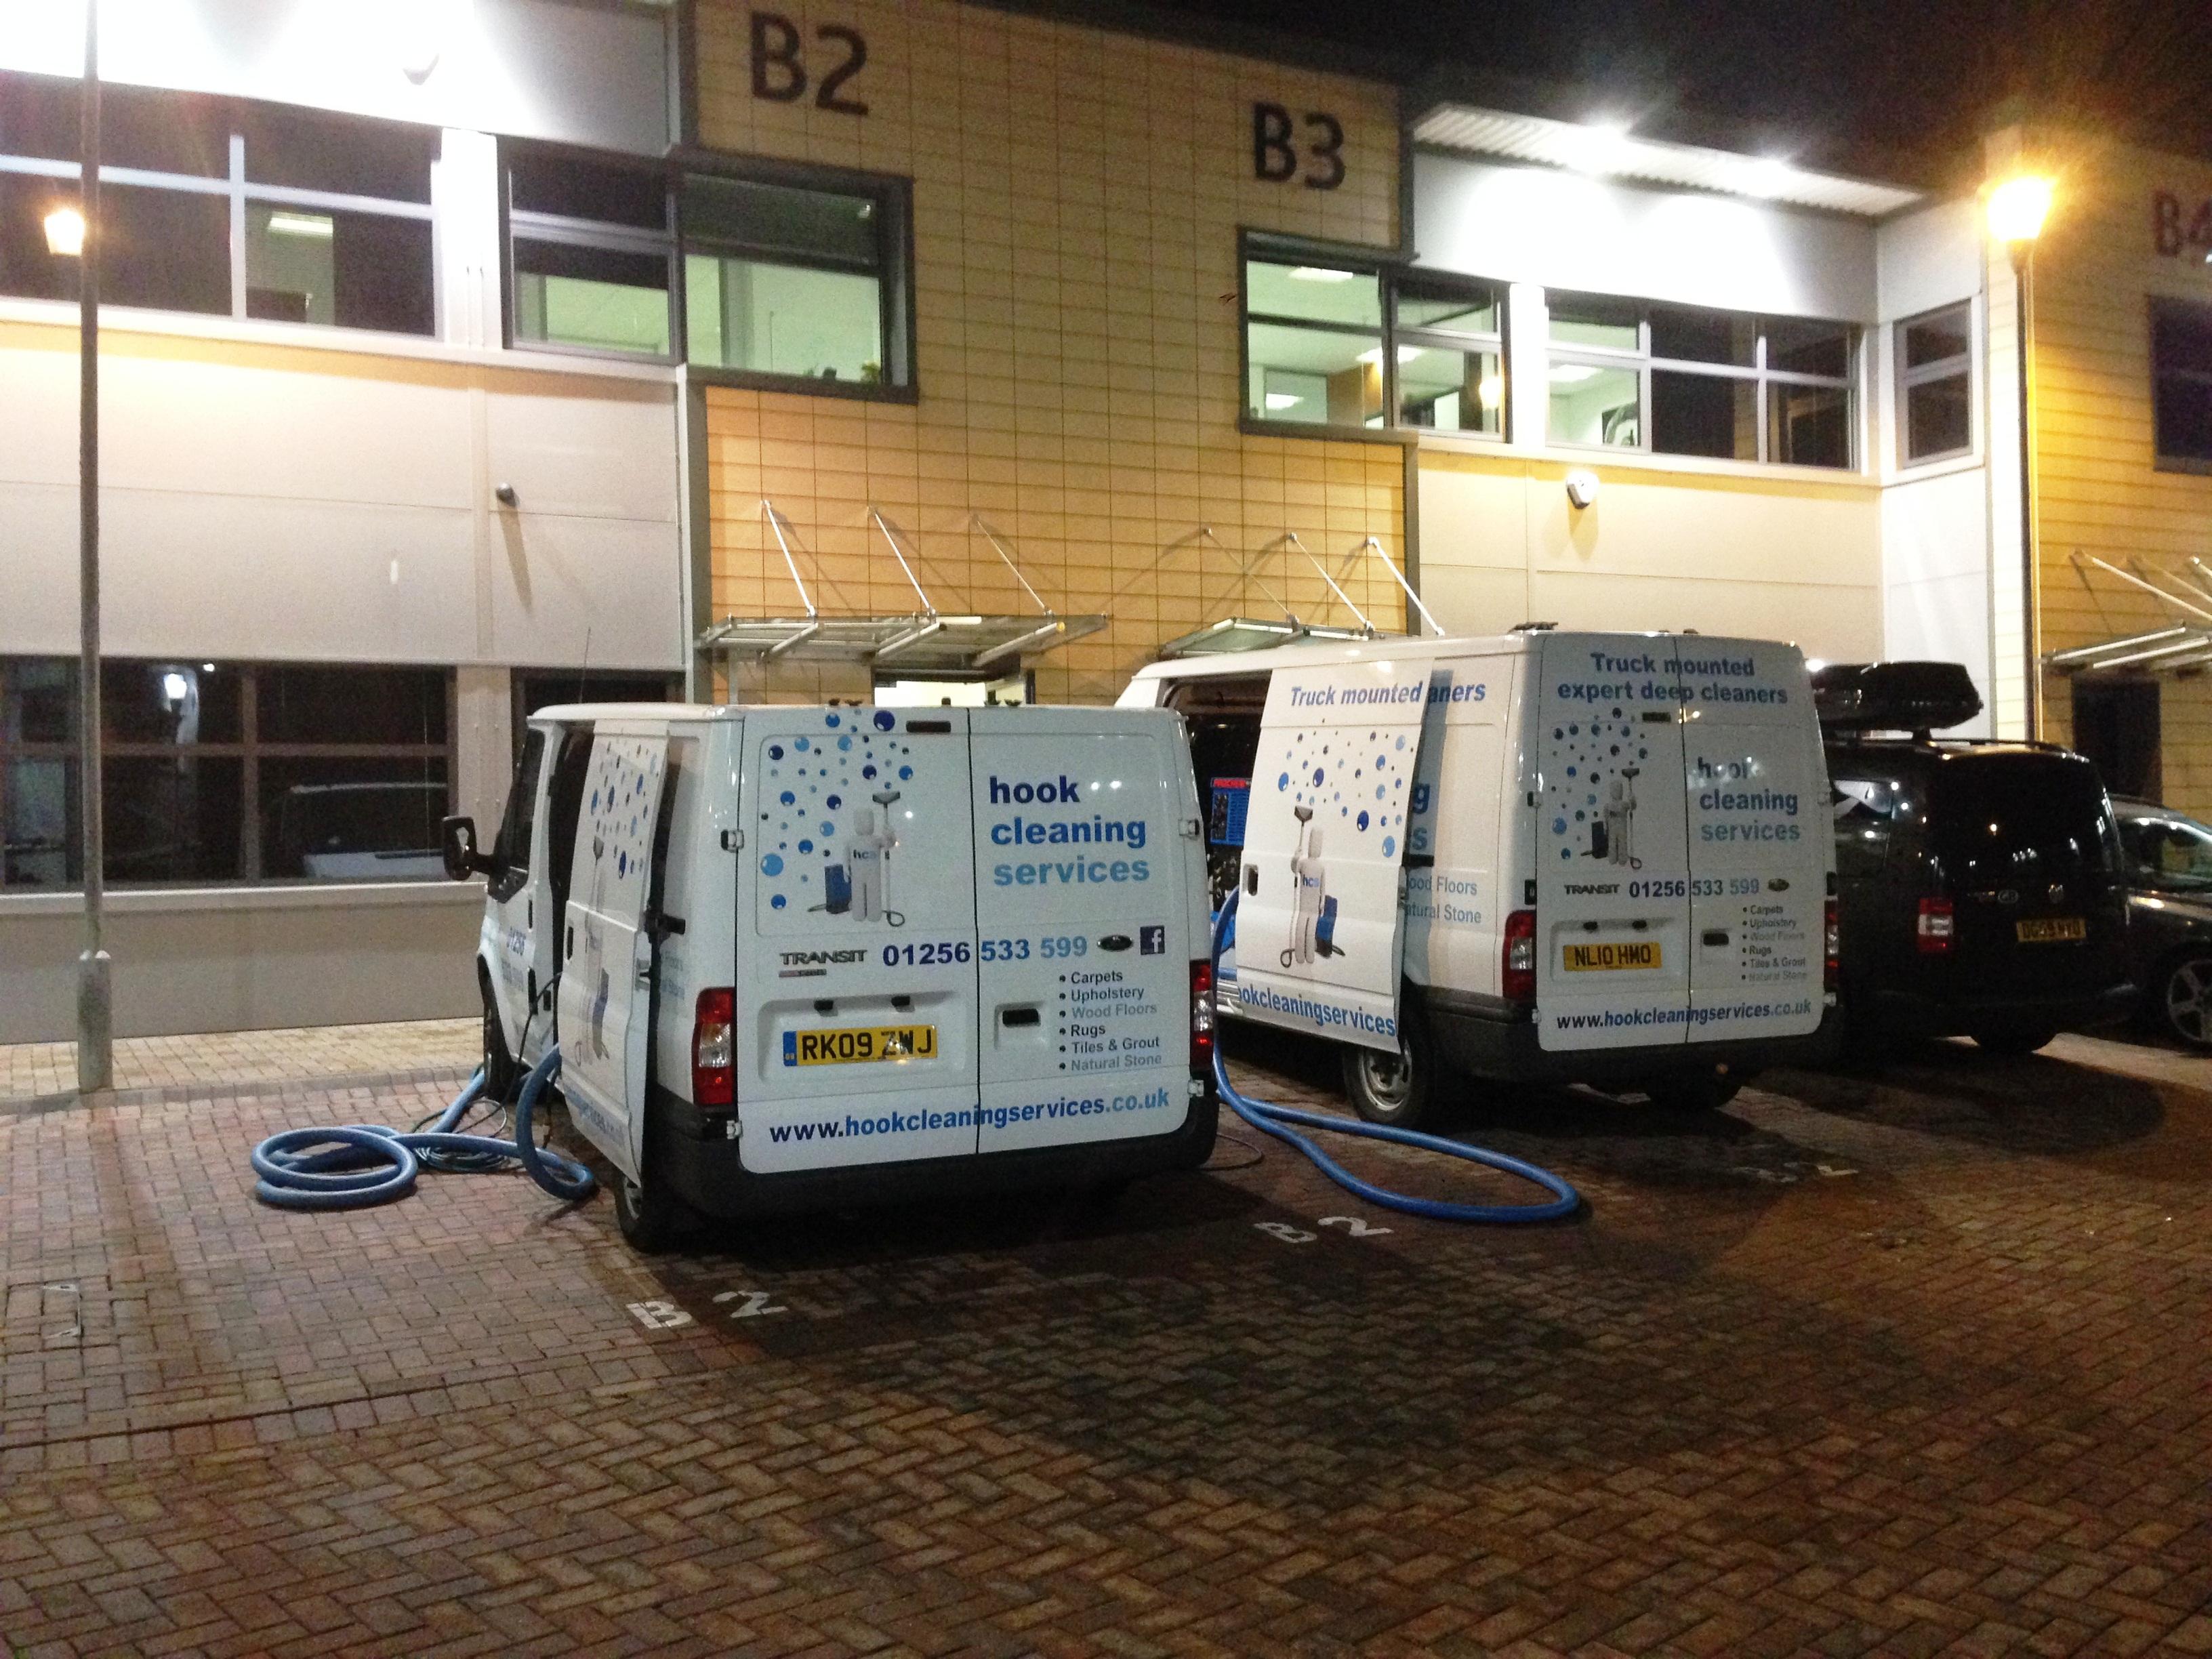 Truck Mounted Carpet Cleaning Equipment Uk Vidalondon